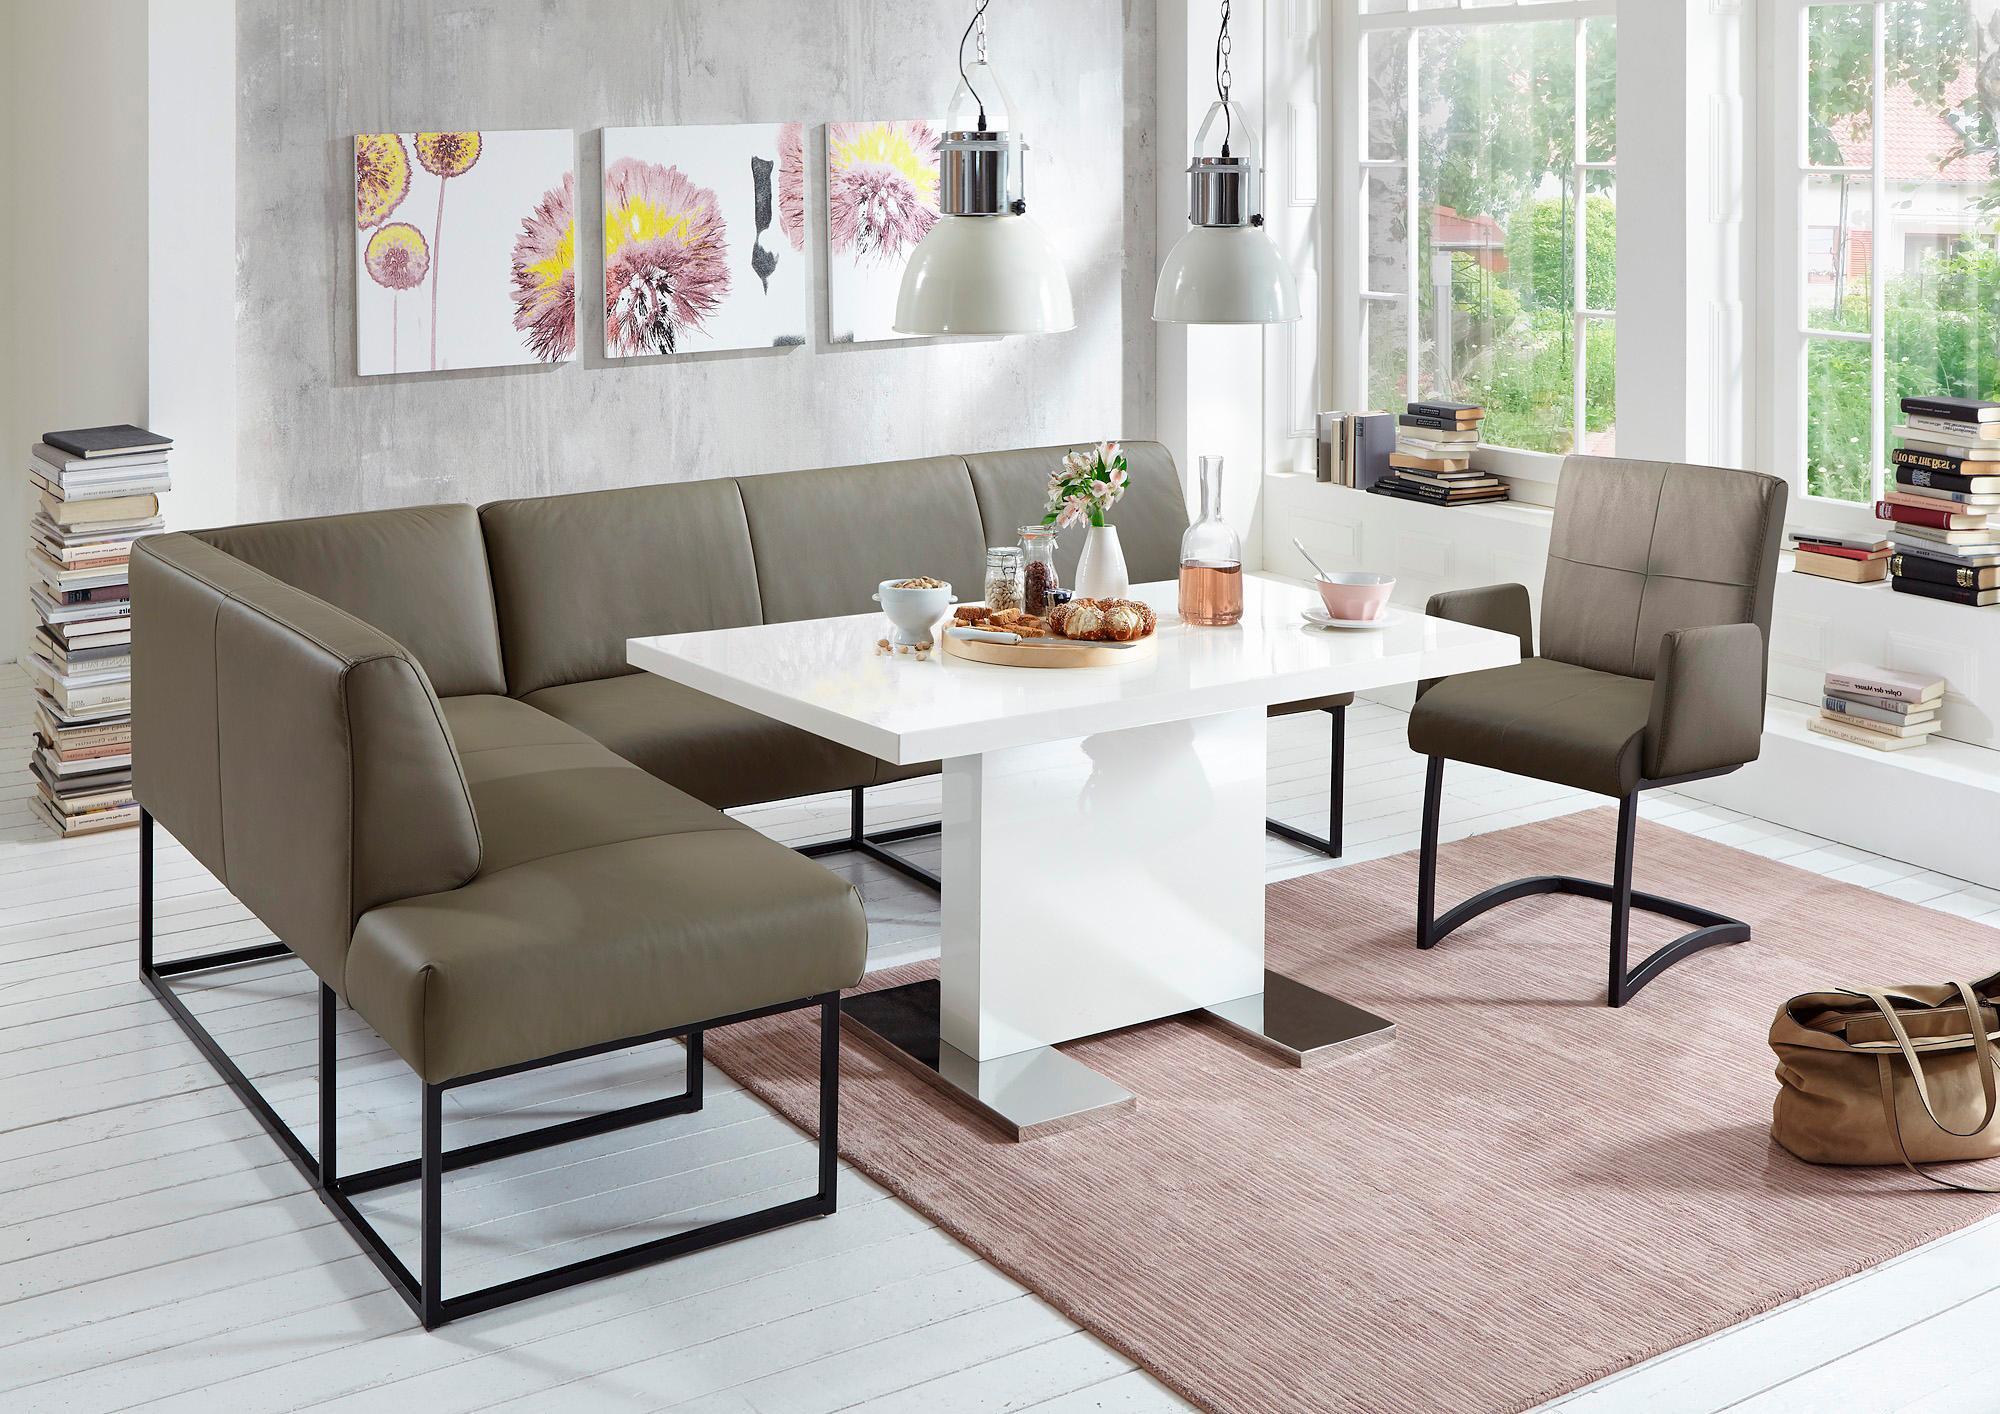 exxpo - sofa fashion Eckbank | Küche und Esszimmer > Sitzbänke > Eckbänke | Blau | EXXPO - SOFA FASHION